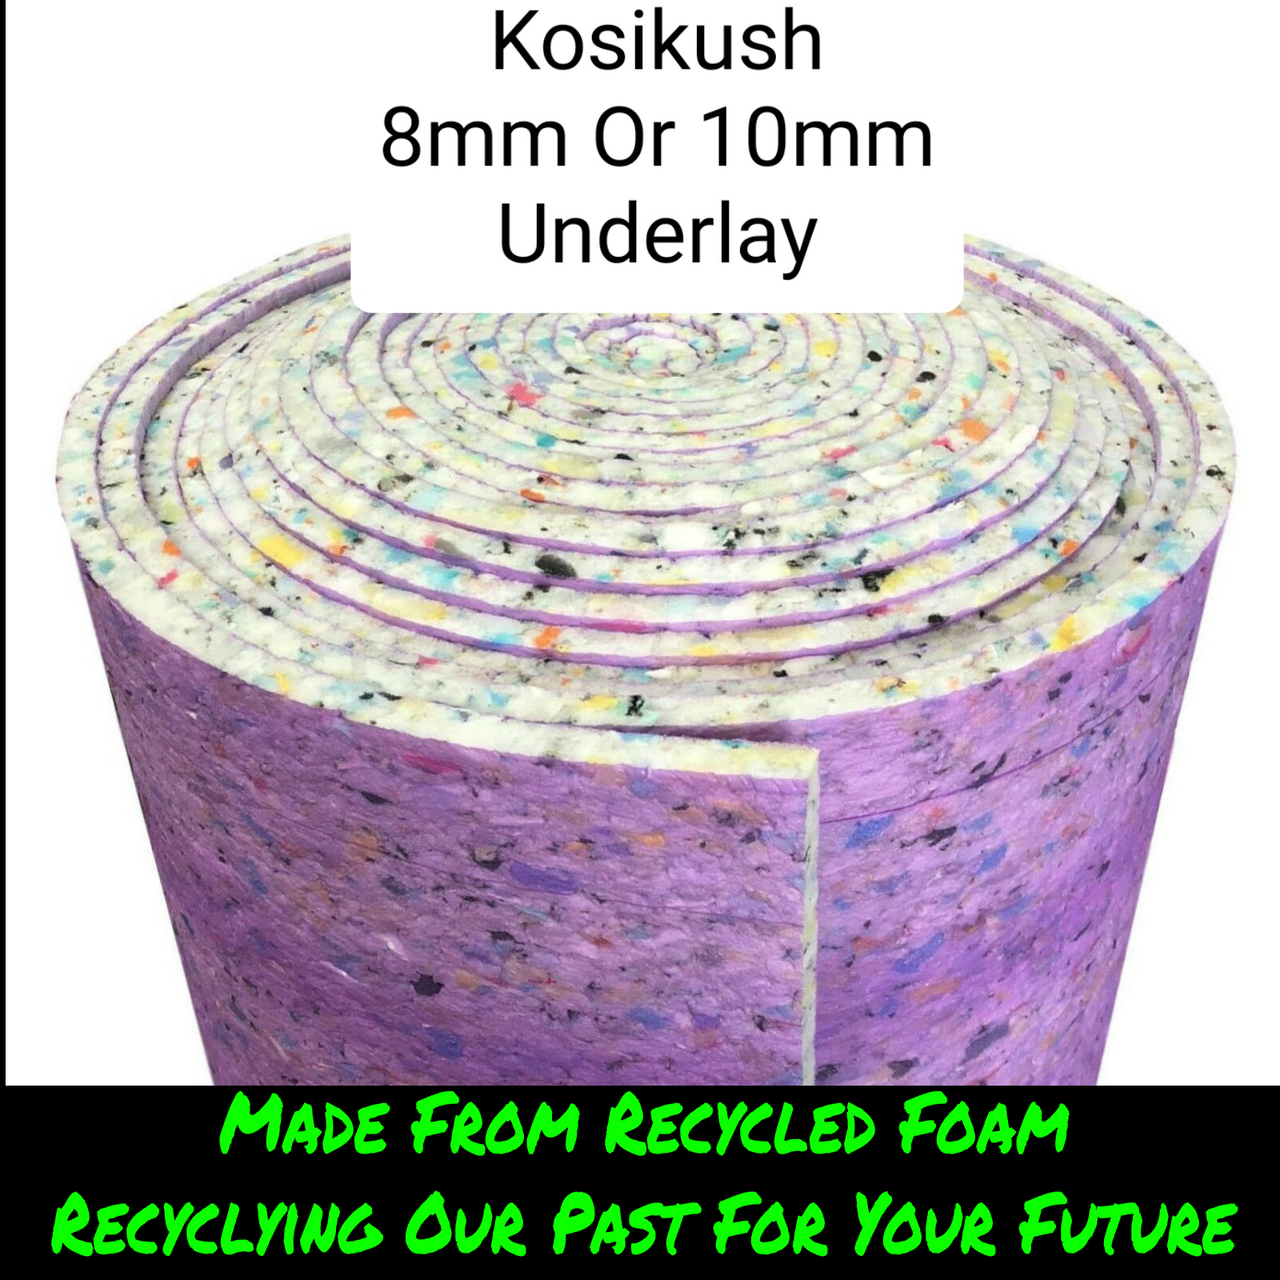 Kosikush Carpet Interfloor Cheap Underlay recycle